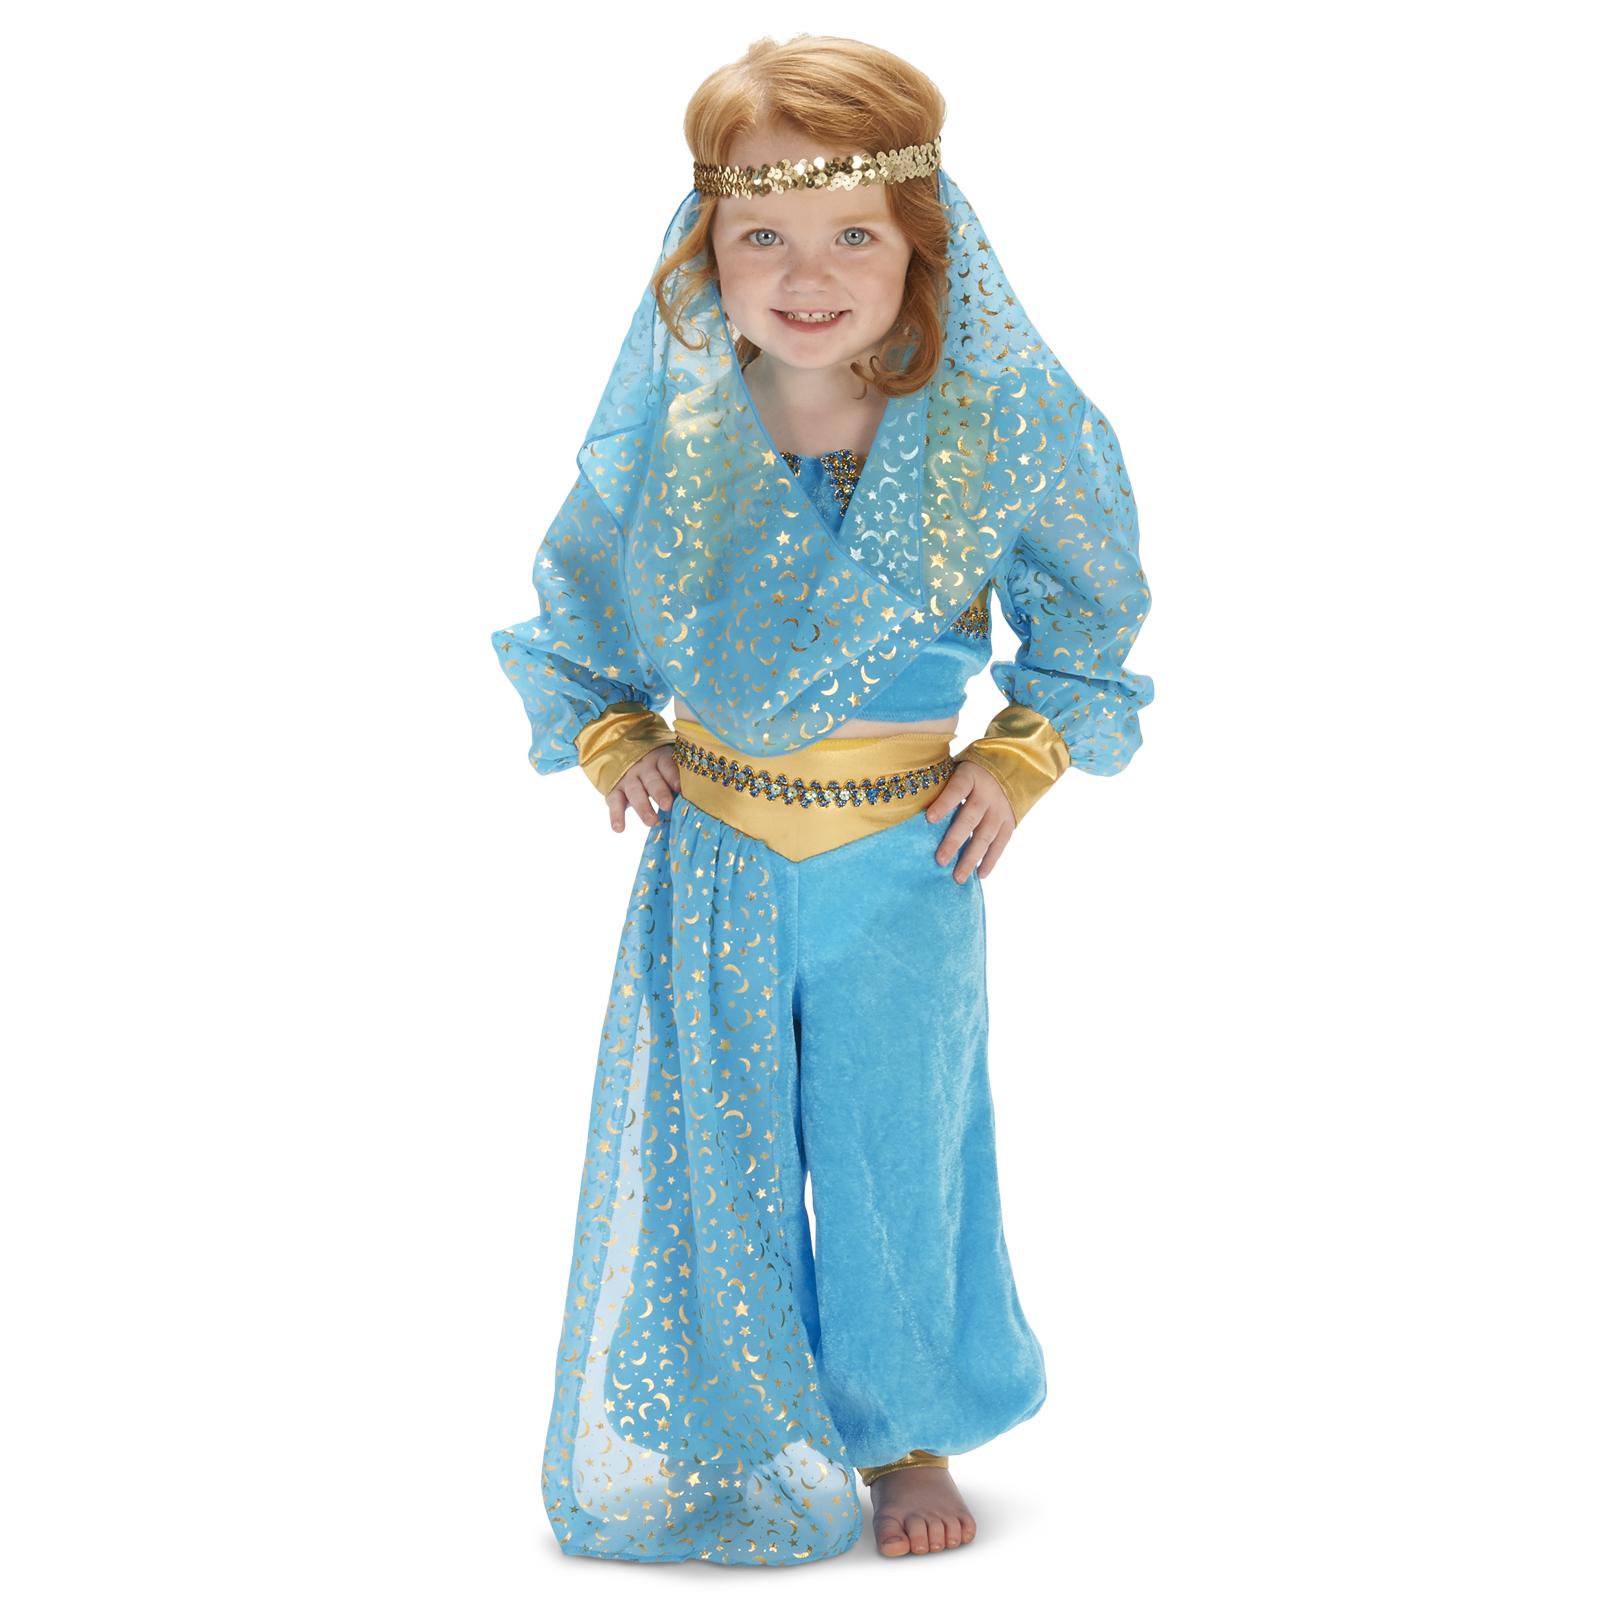 Mystic Genie Toddler Costume